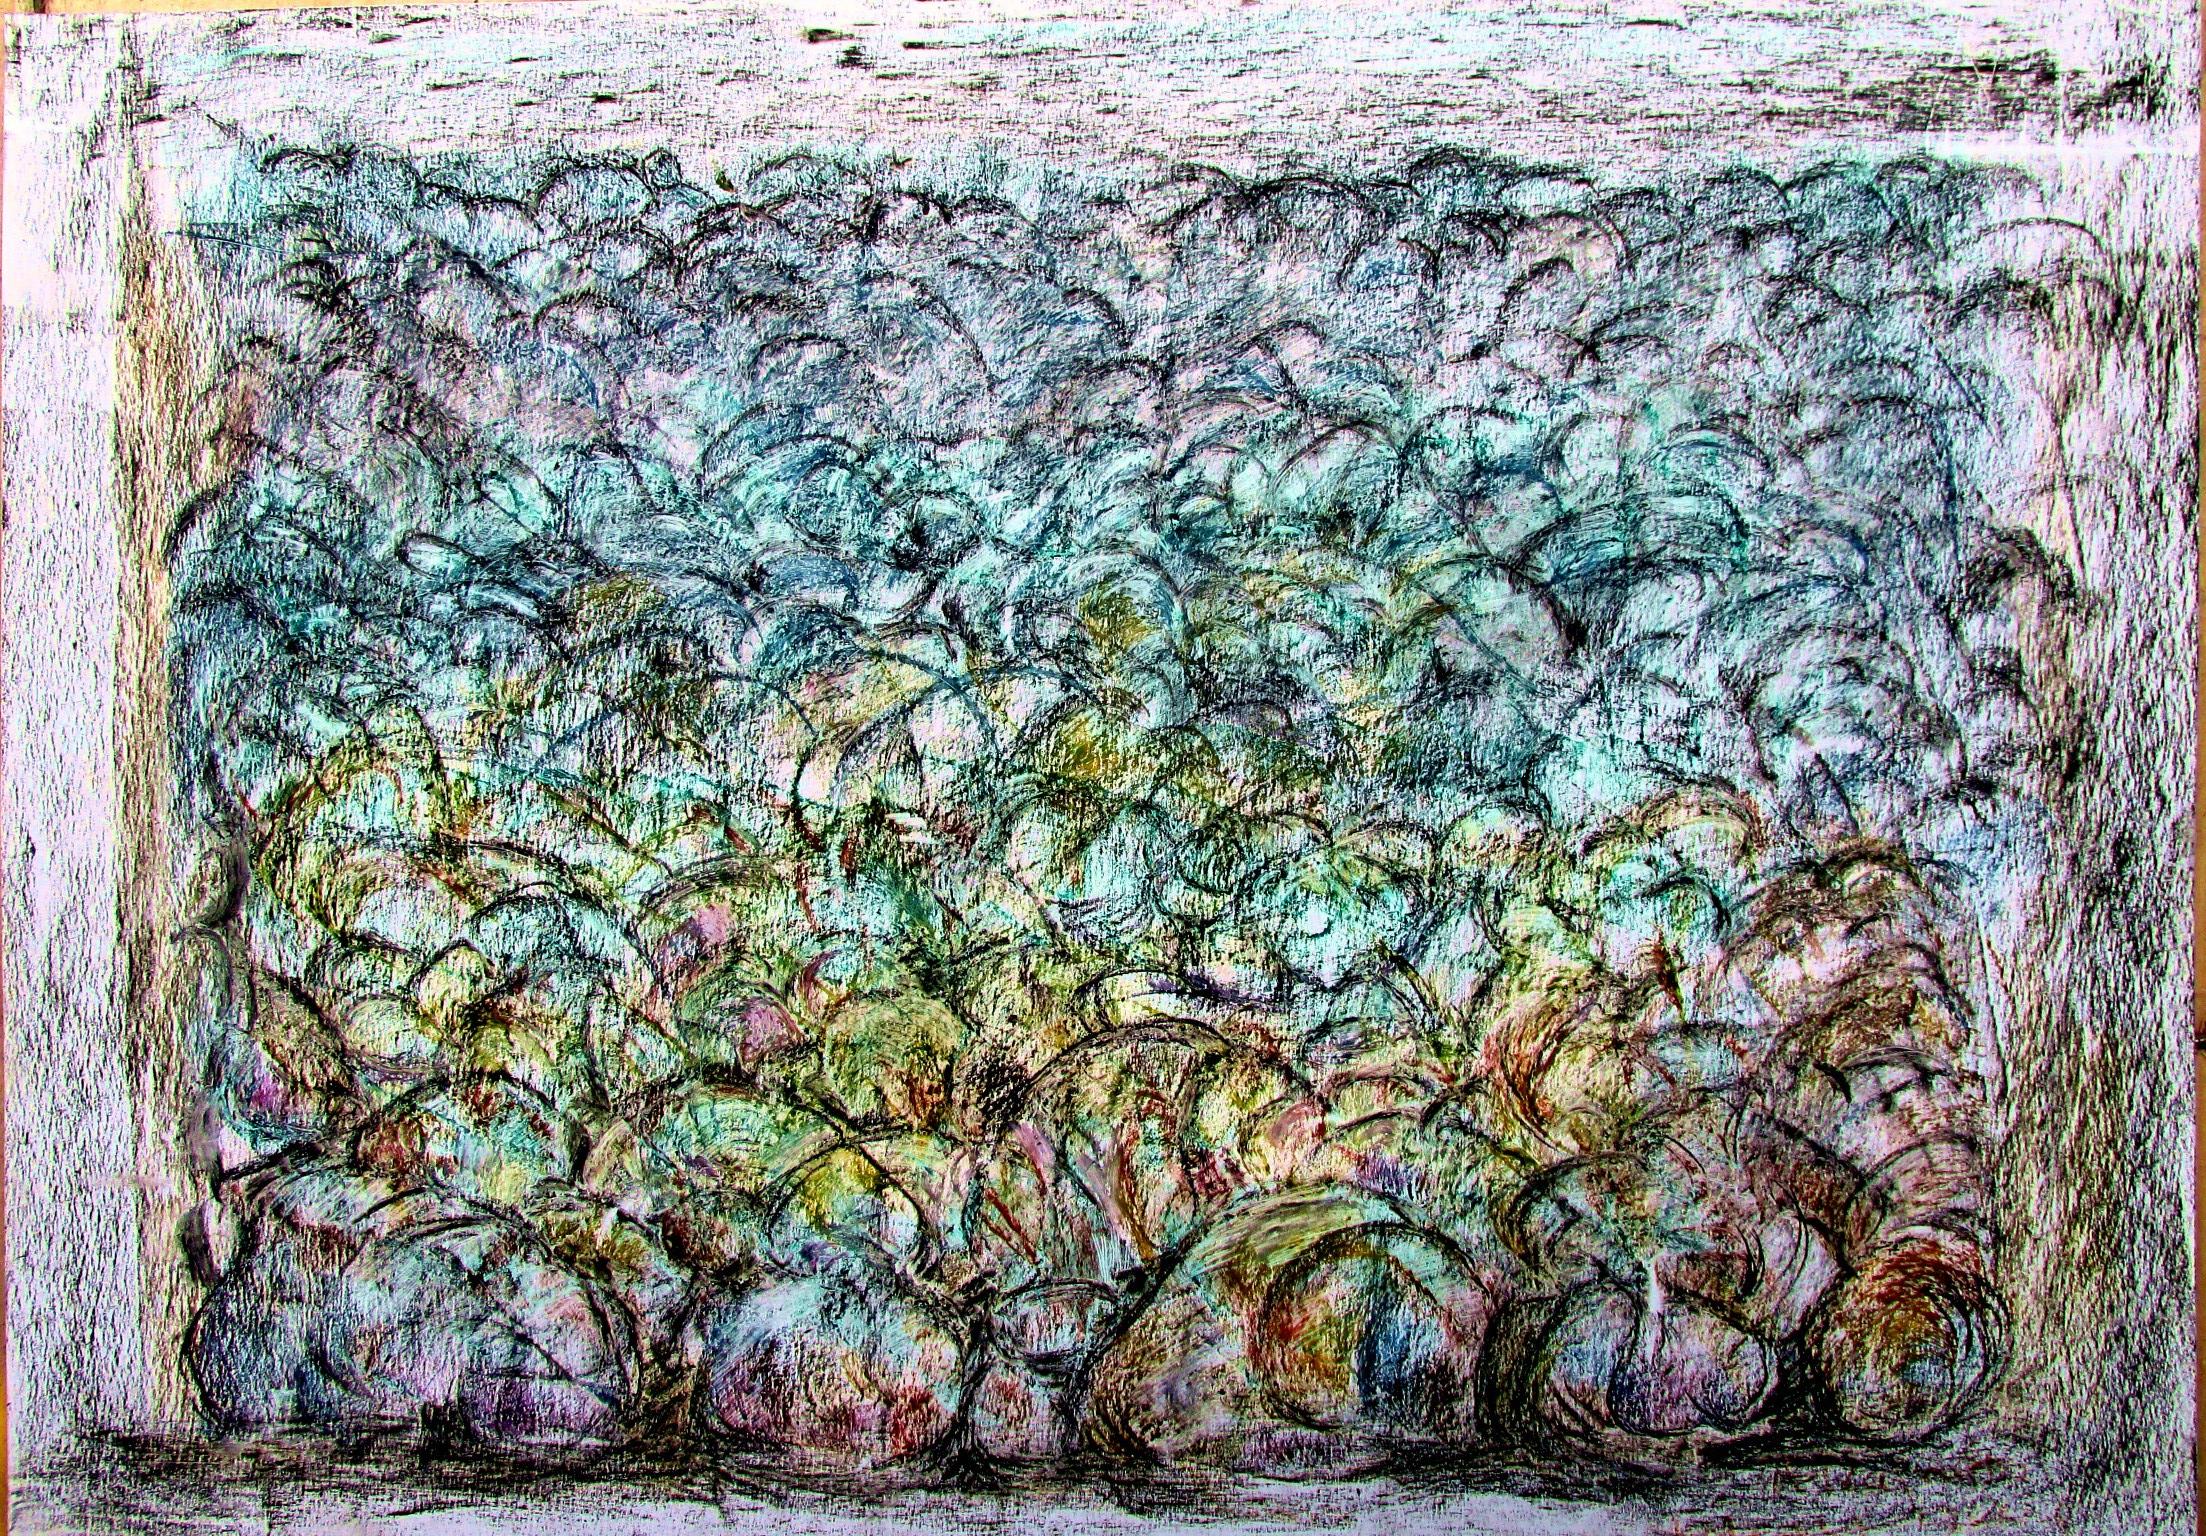 pebble-series-31-oil-pastel-on-silk-paper-32-x-45cm.jpg